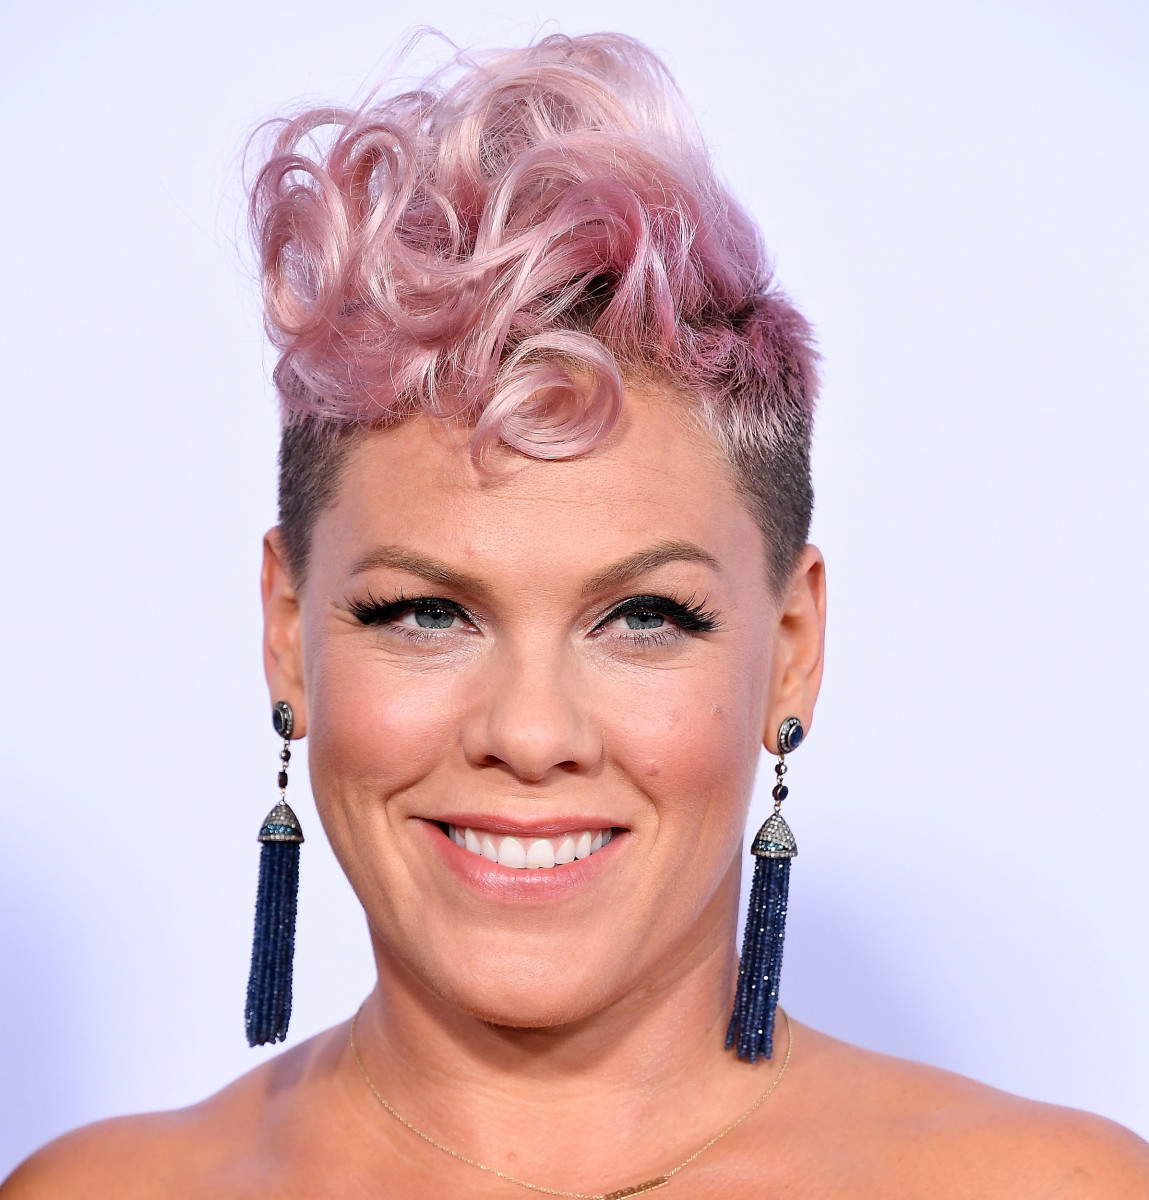 Pink, American Music Awards, 2017